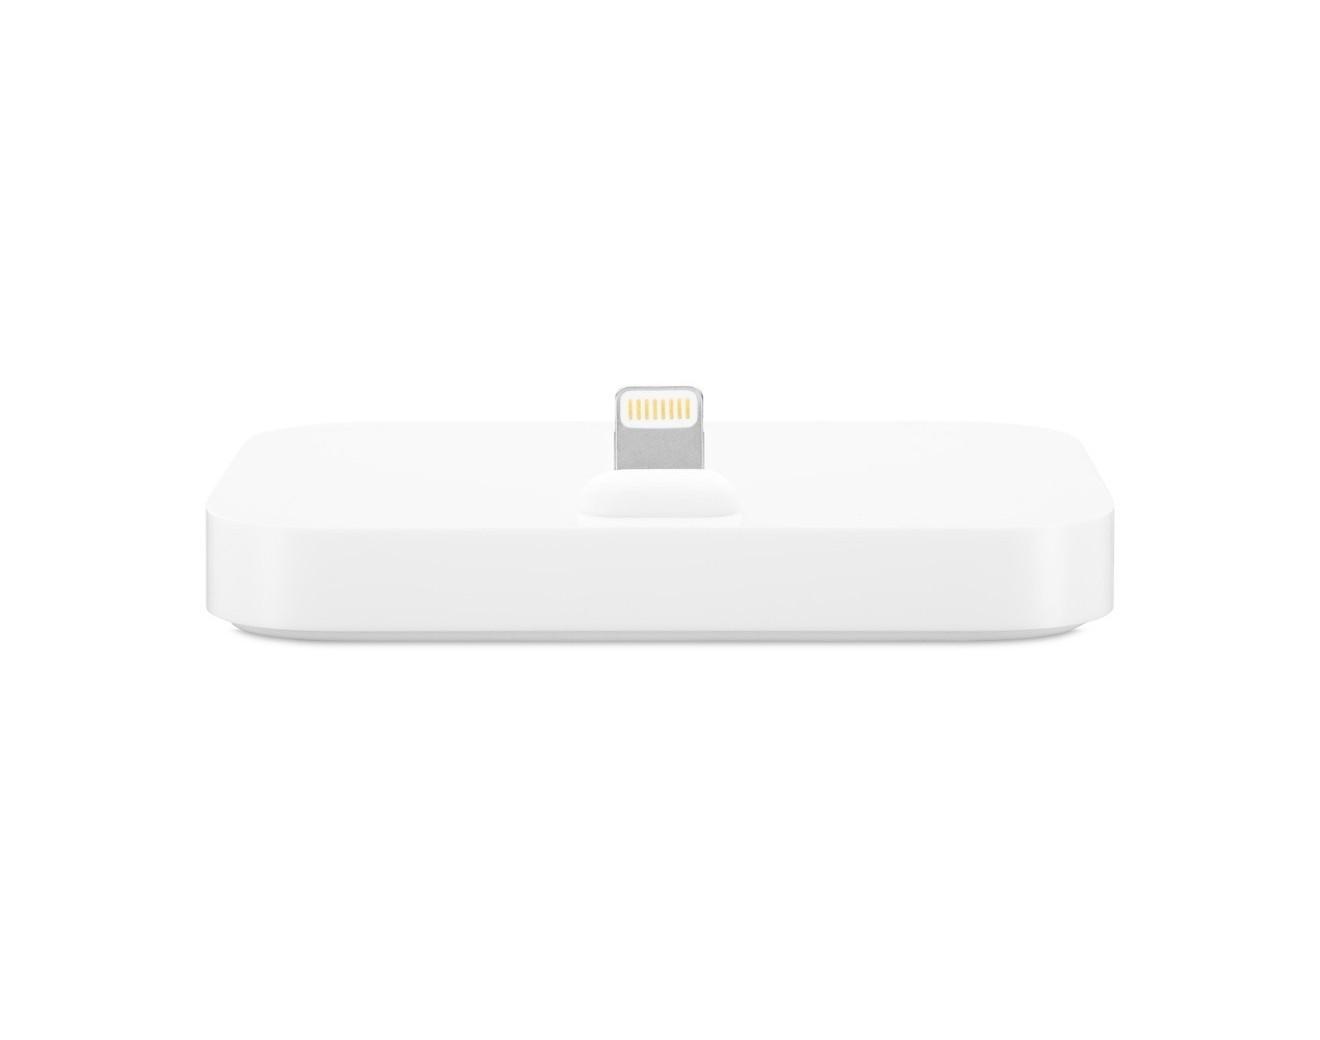 Докинг станция Apple iPhone Lightning Dock - White